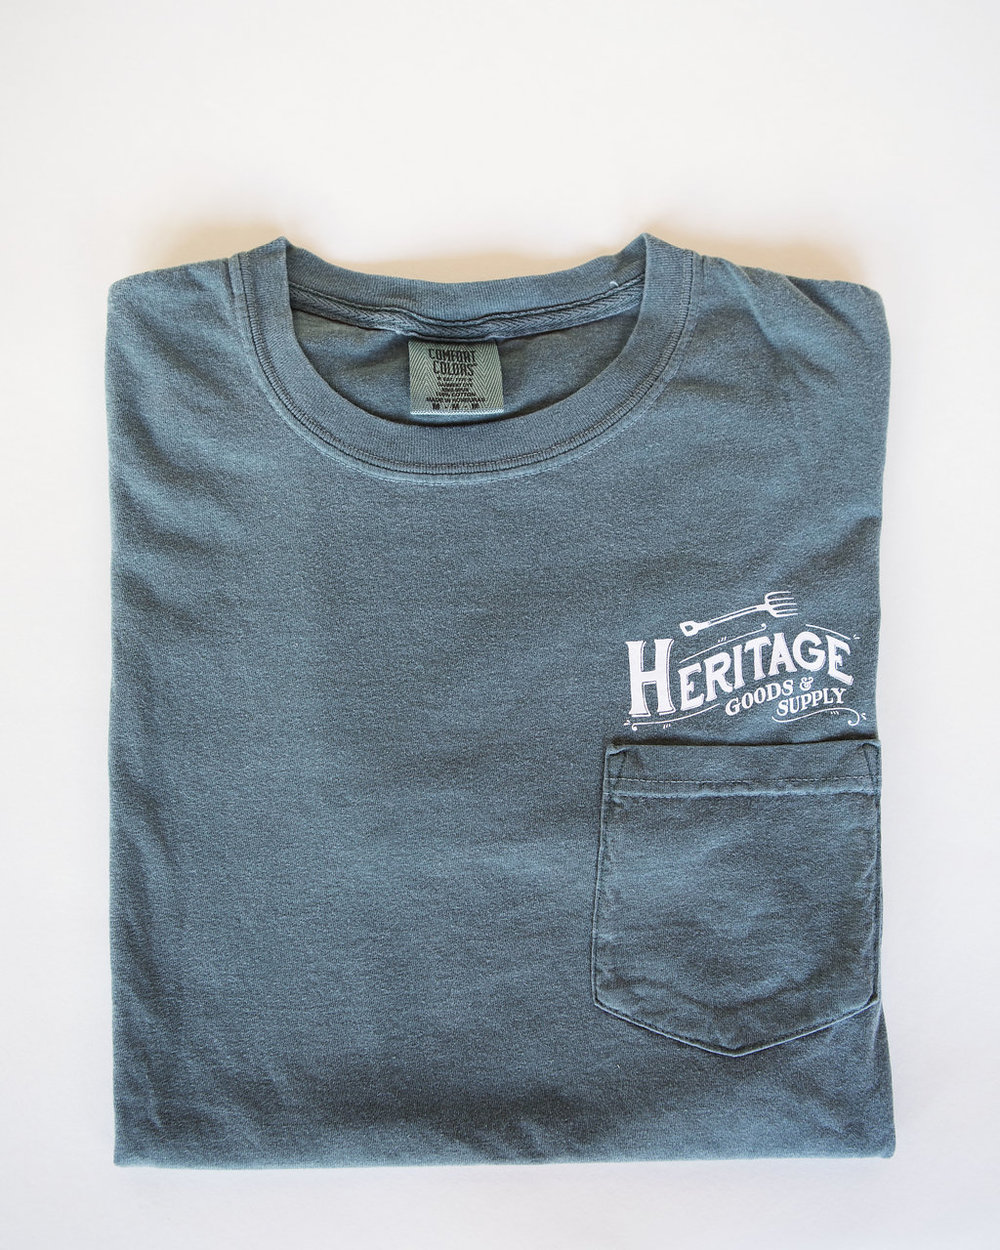 HG&S Men's Pocket Tee